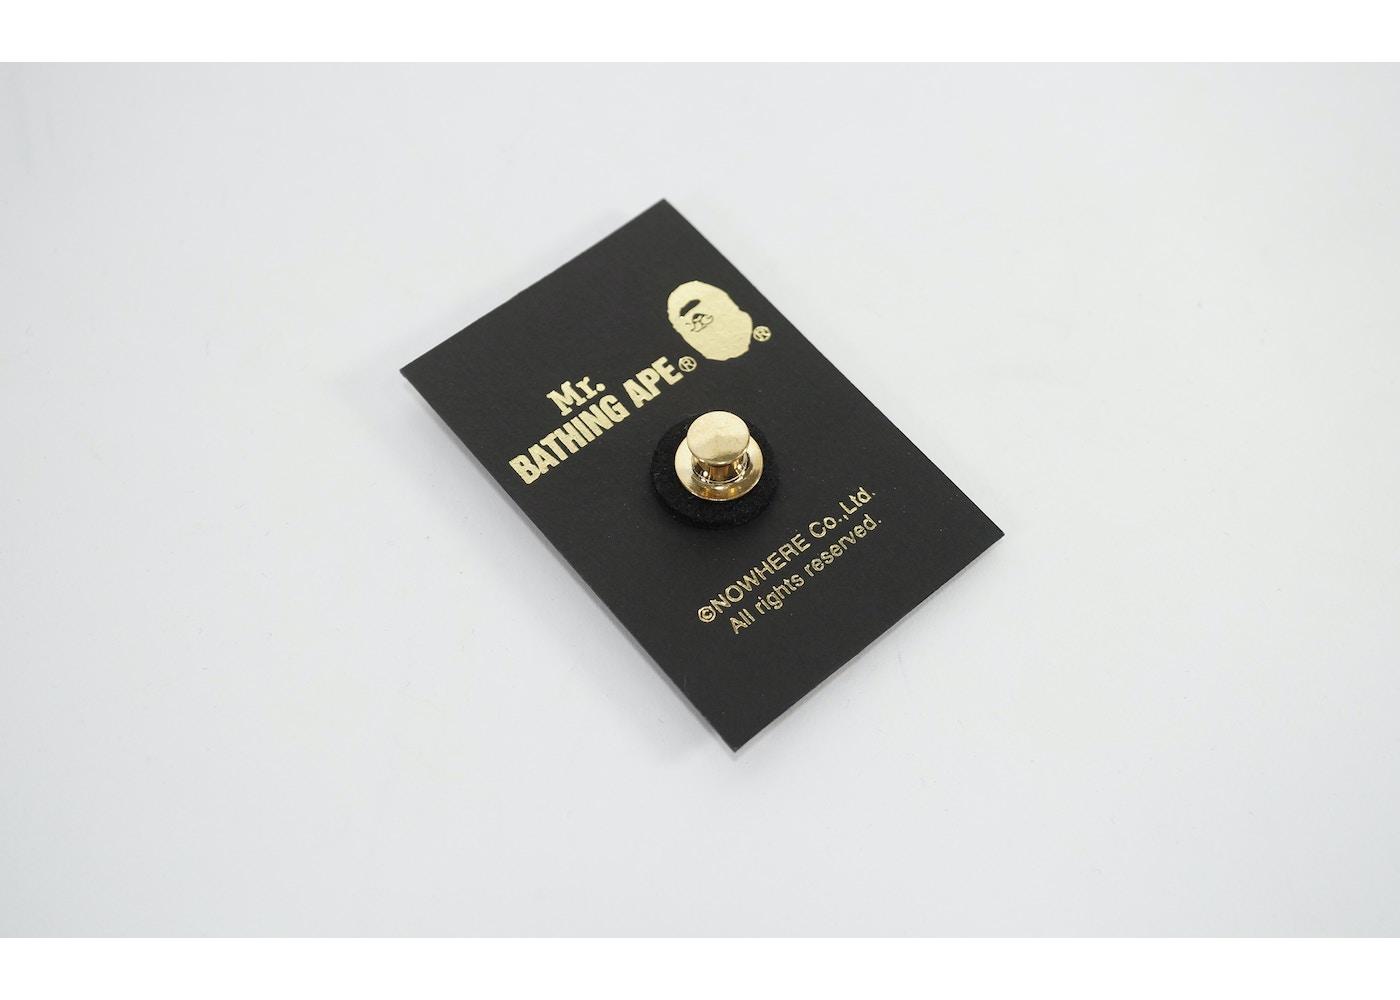 33ae7af6 BAPE Mr. Bathing Ape Gold Apehead Lapel Pin Gold -